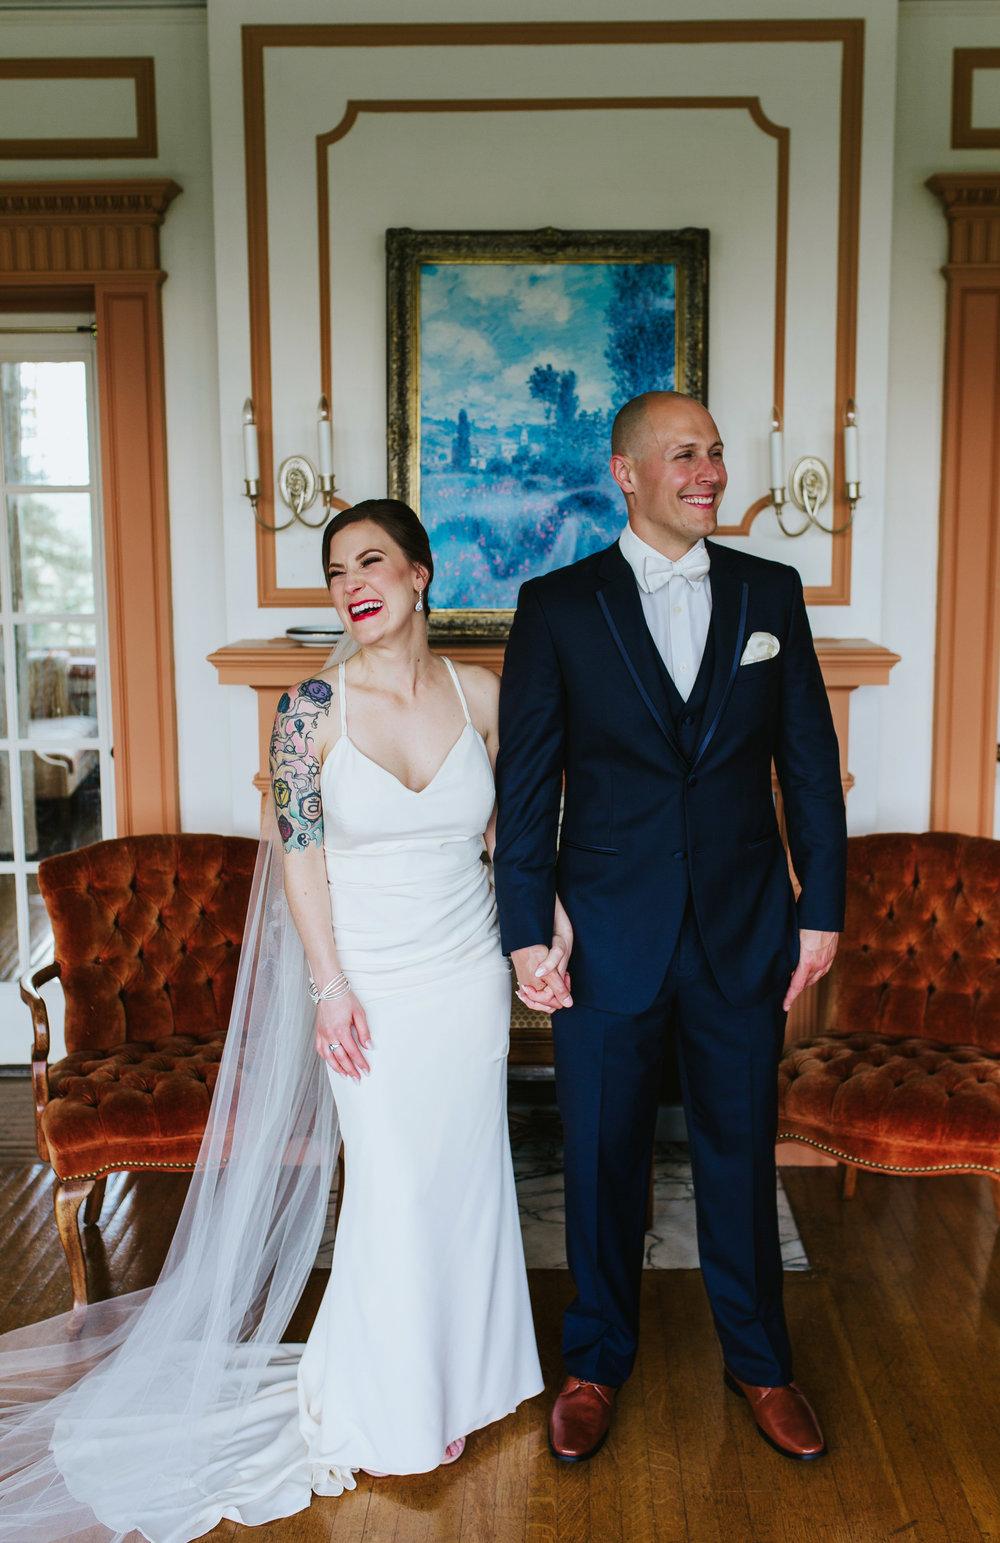 Linden Hall PA Wedding Bride and Groom Portraits5.jpg